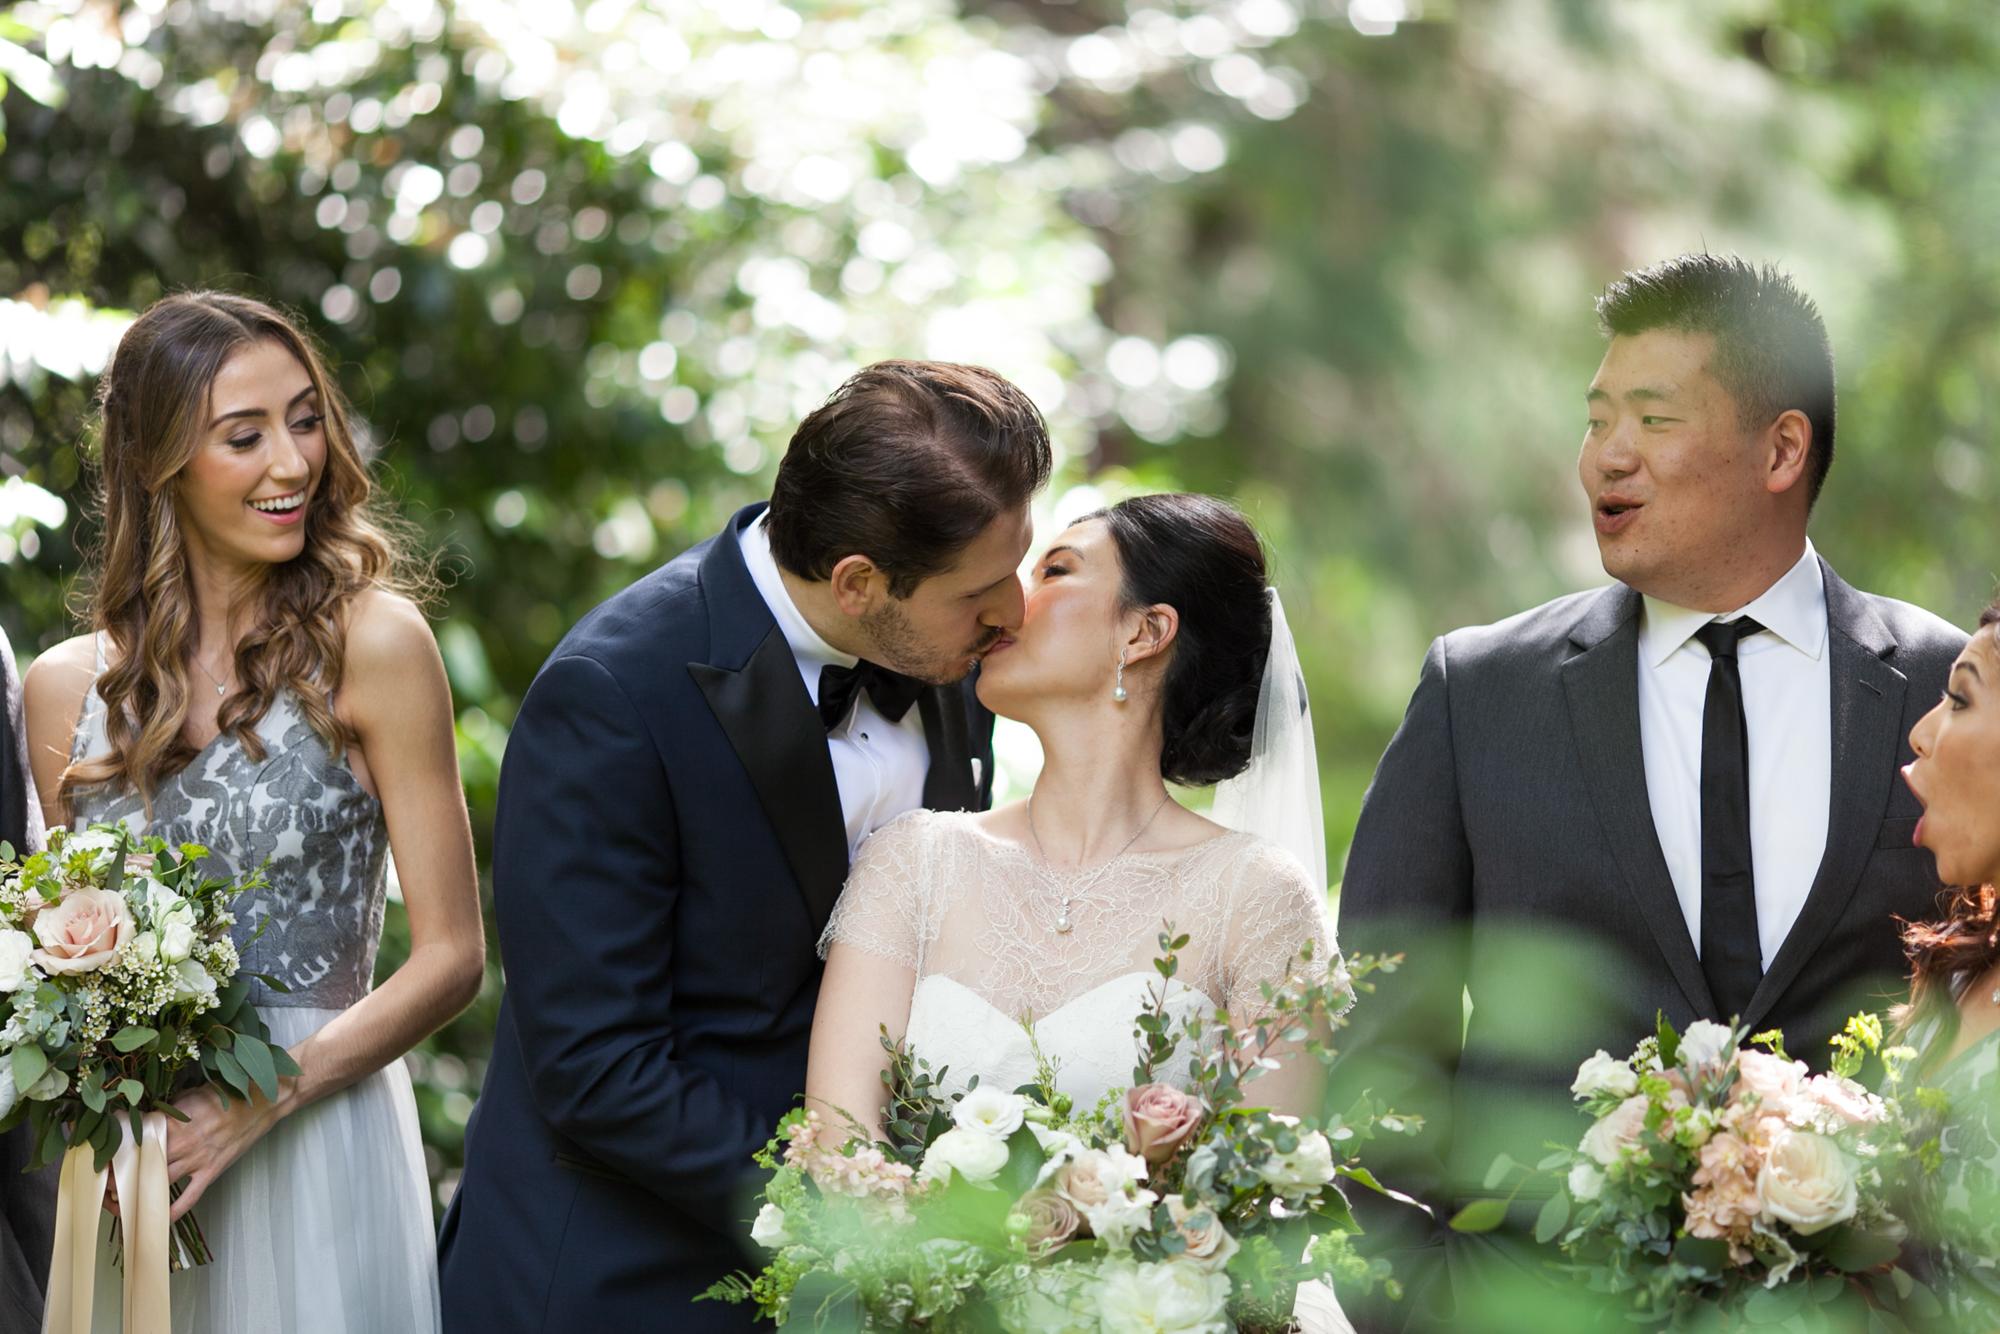 vancouver-luxury-wedding-photographer-lori-miles-010.jpg